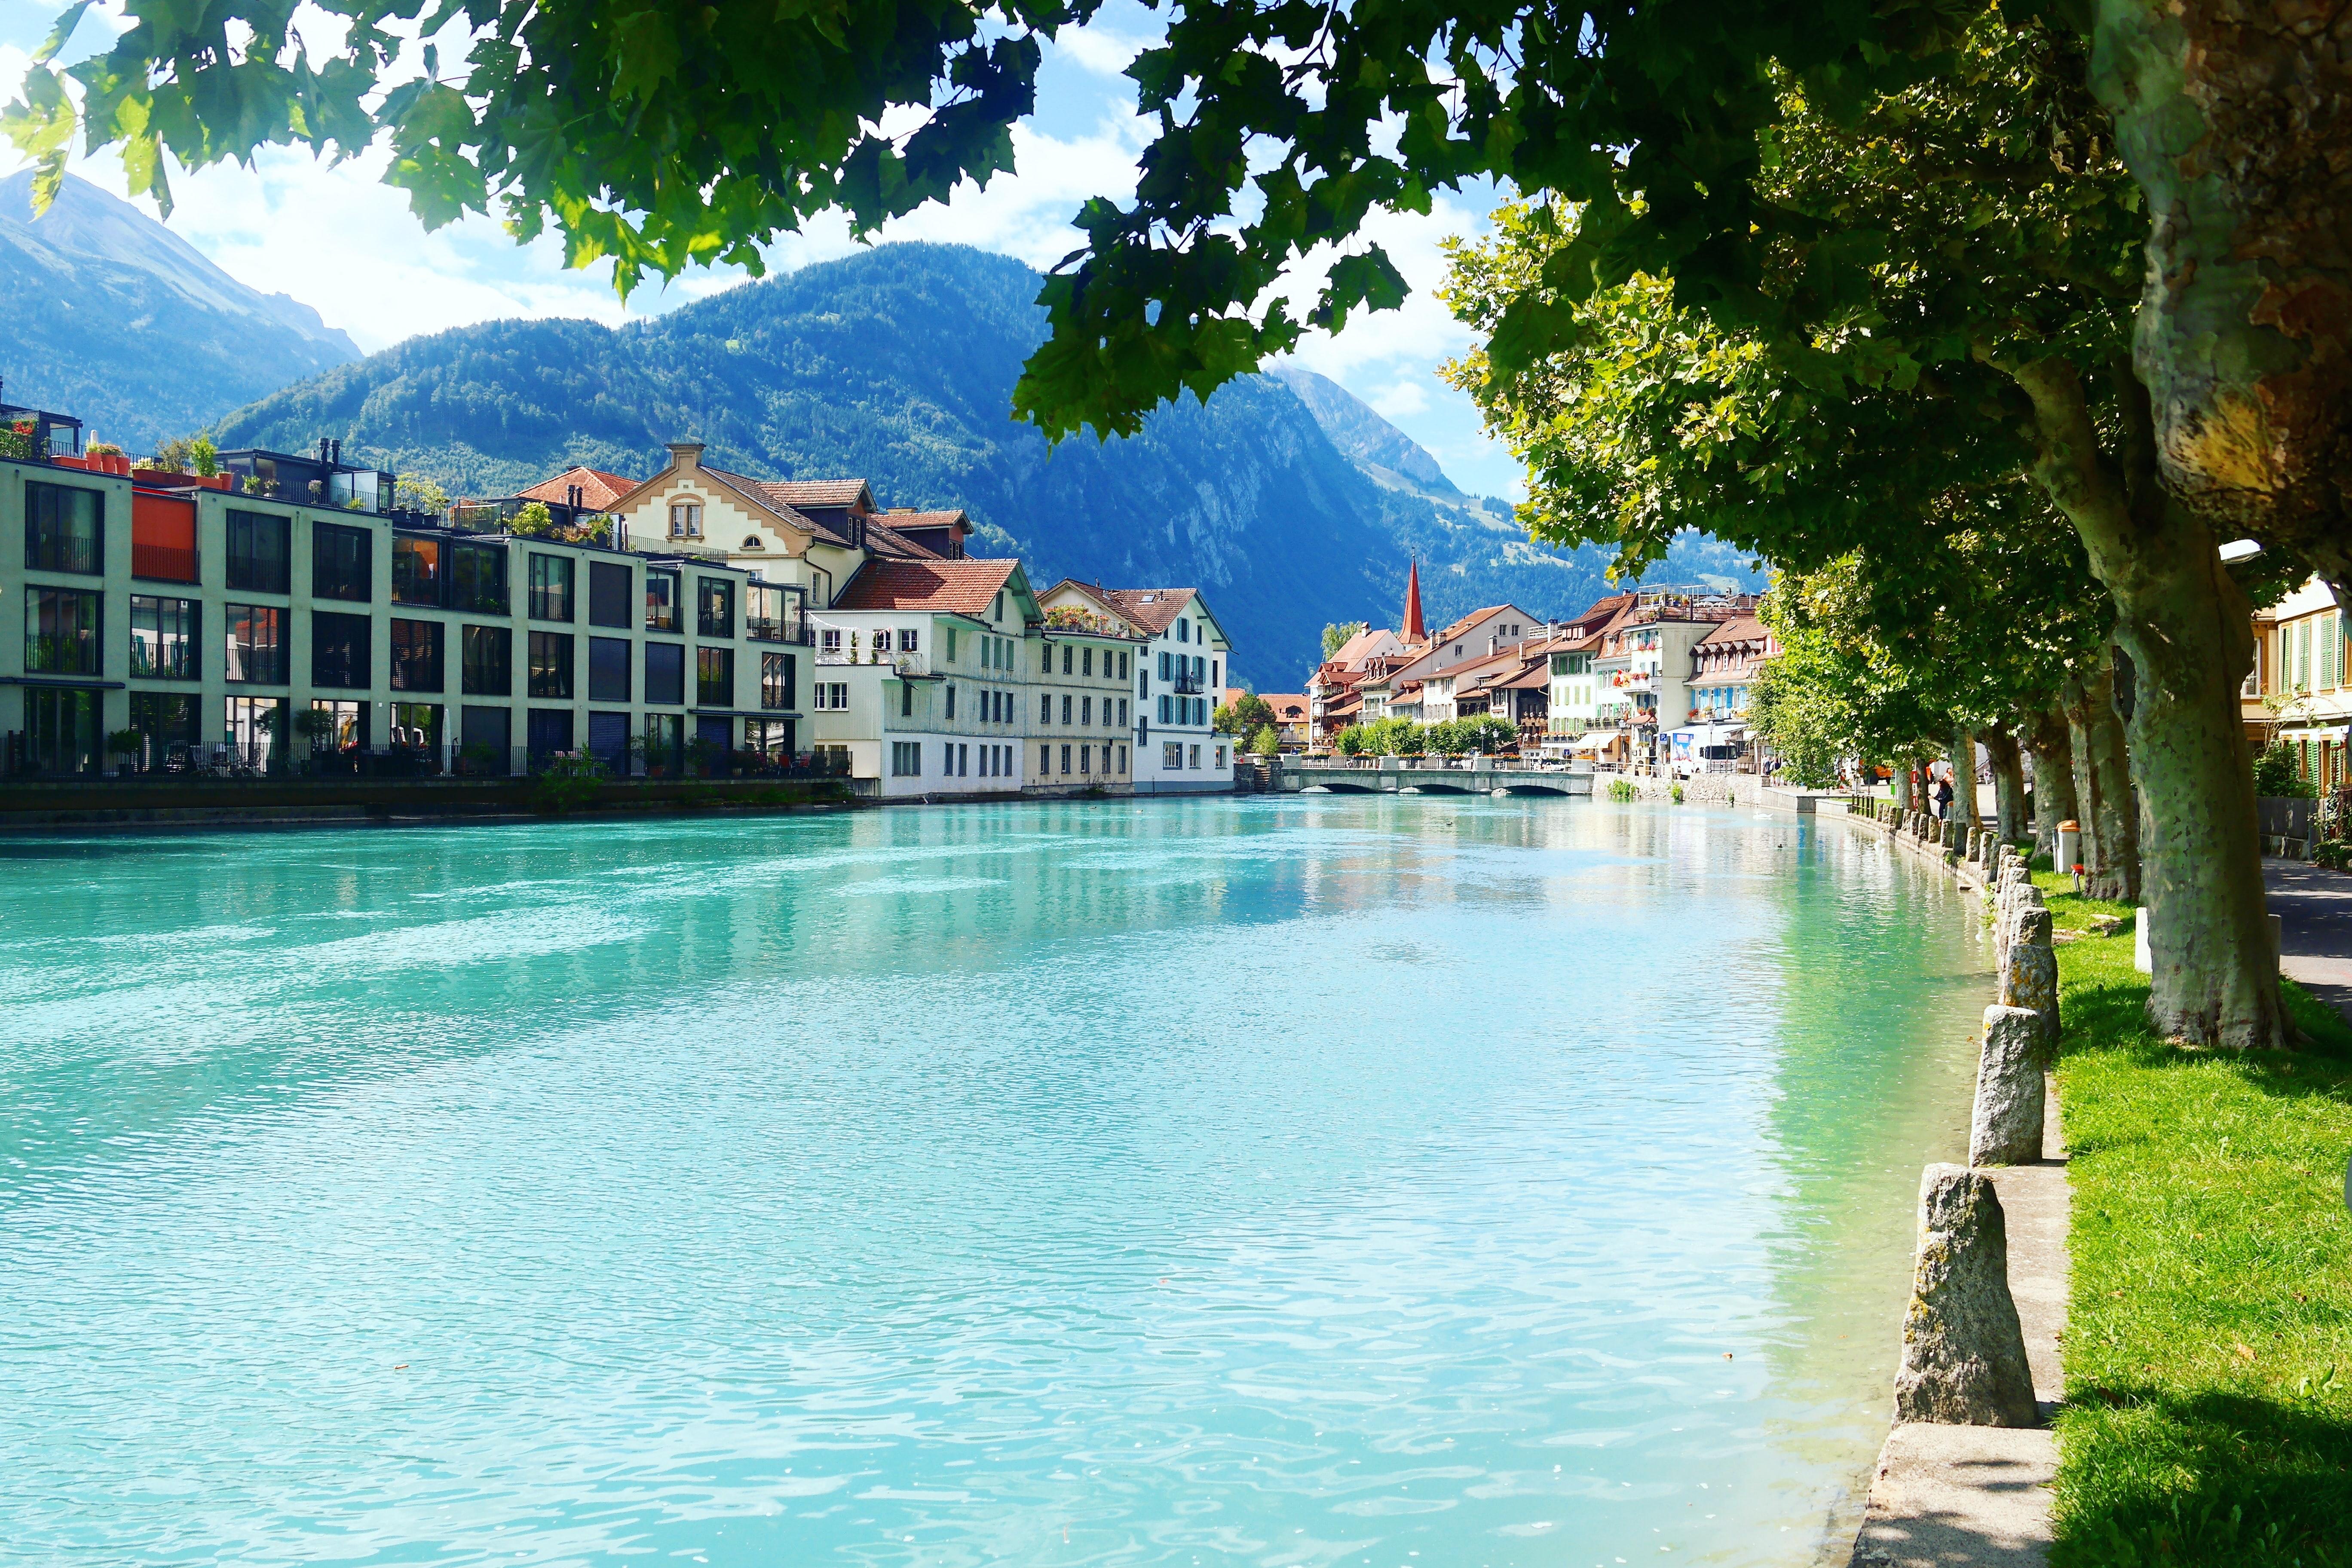 Interlaken, 10 Best Honeymoon Places To Visit in Switzerland